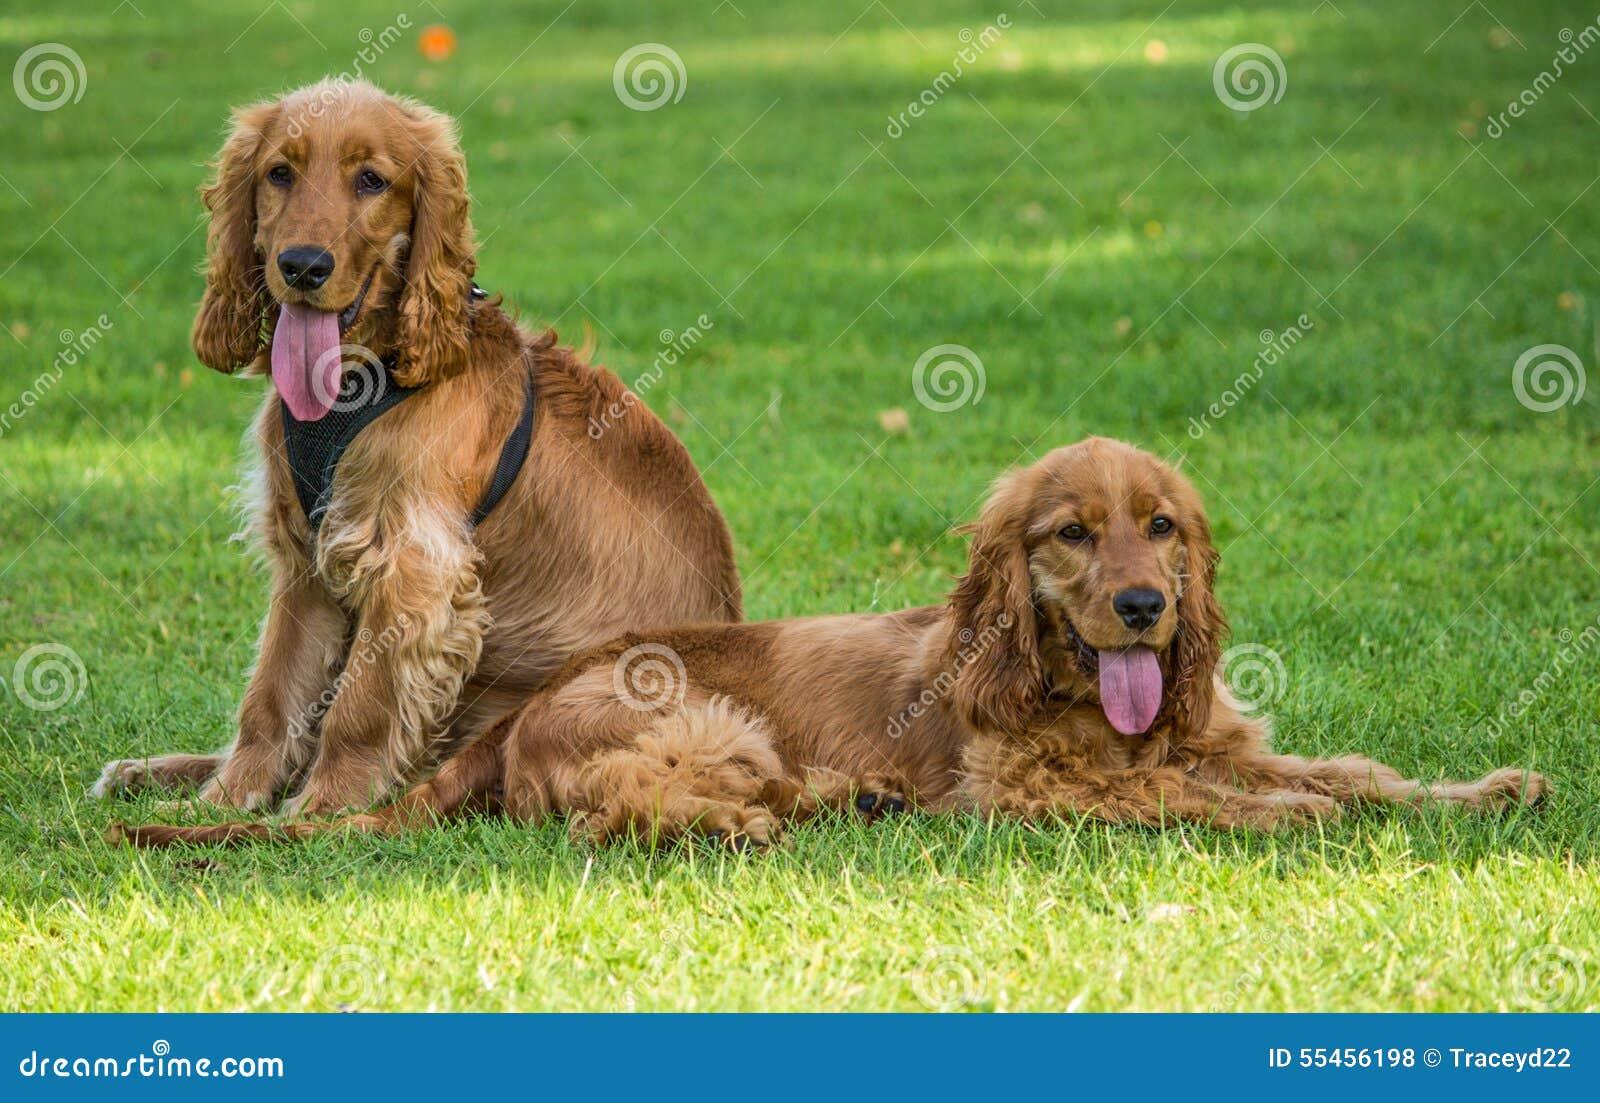 Golden Cocker Spaniel dog breed.